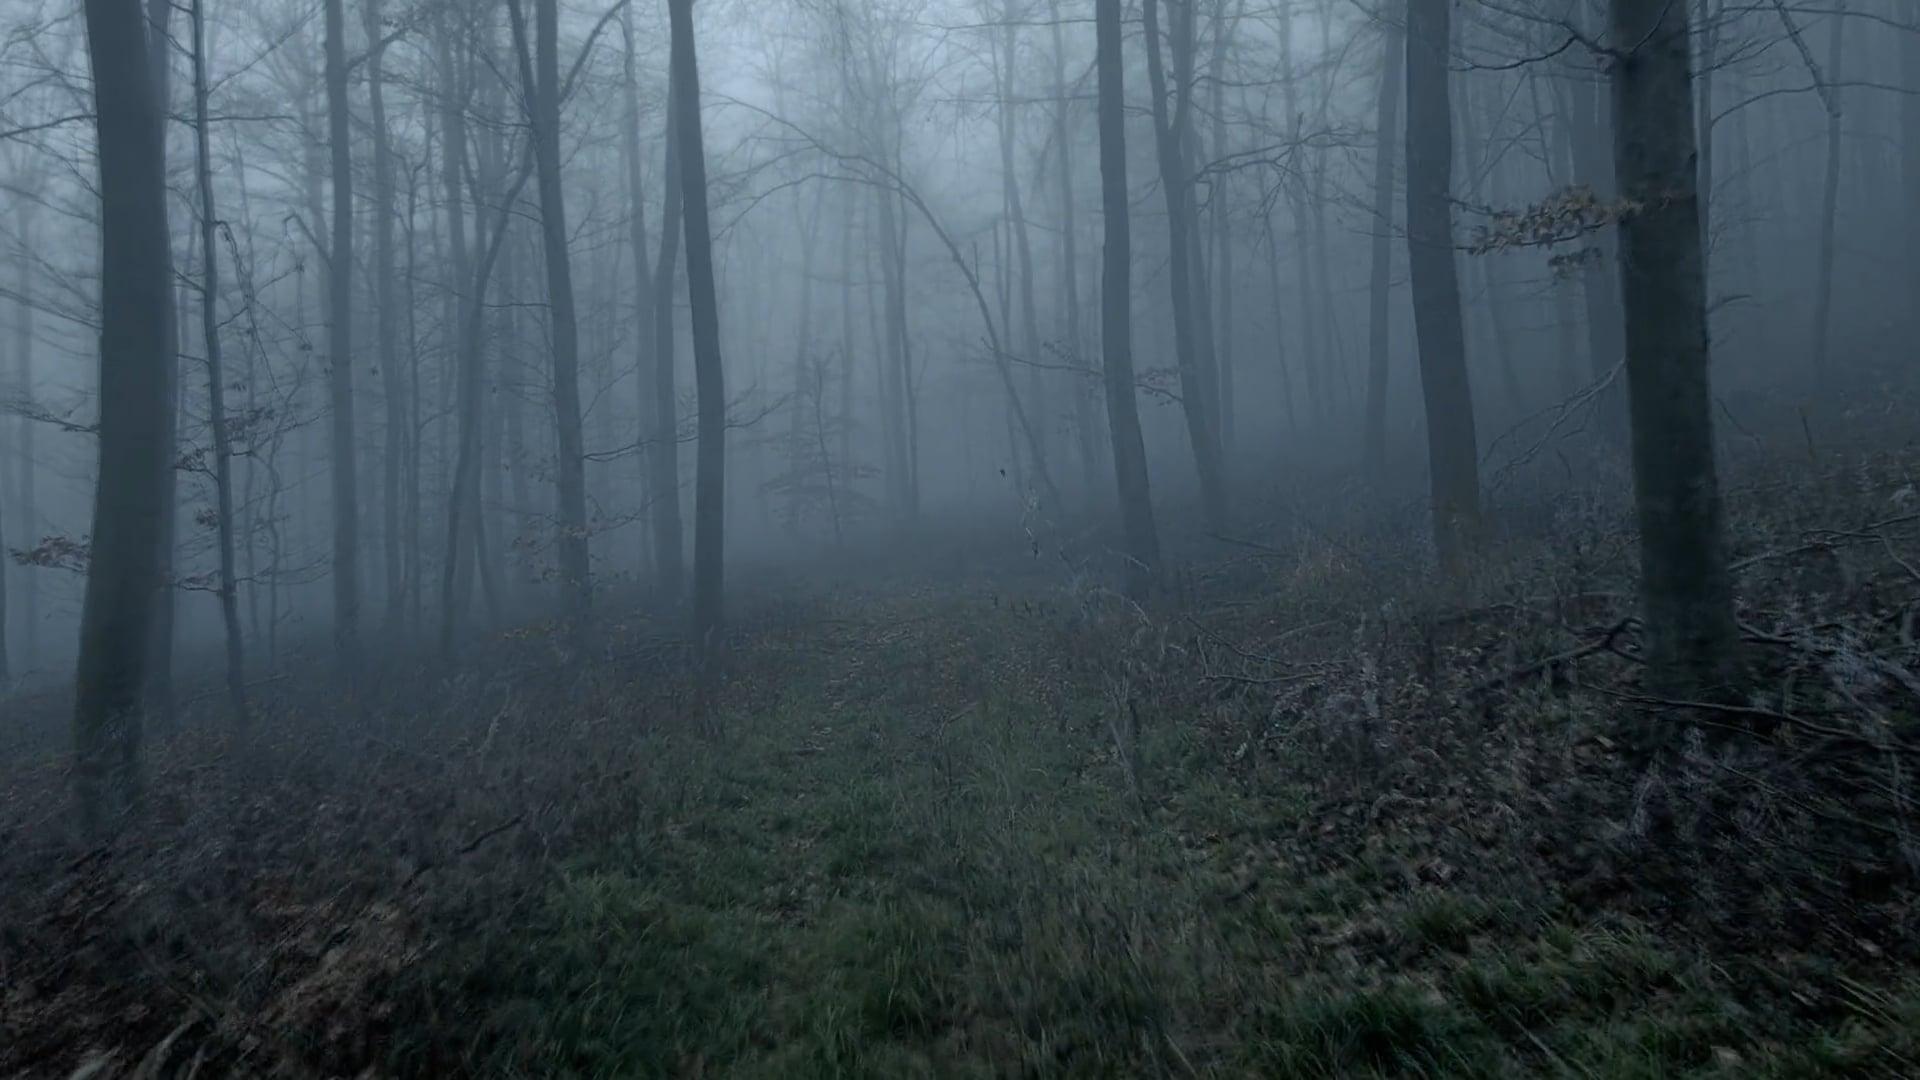 Fagyott május / Frozen may - Trailer